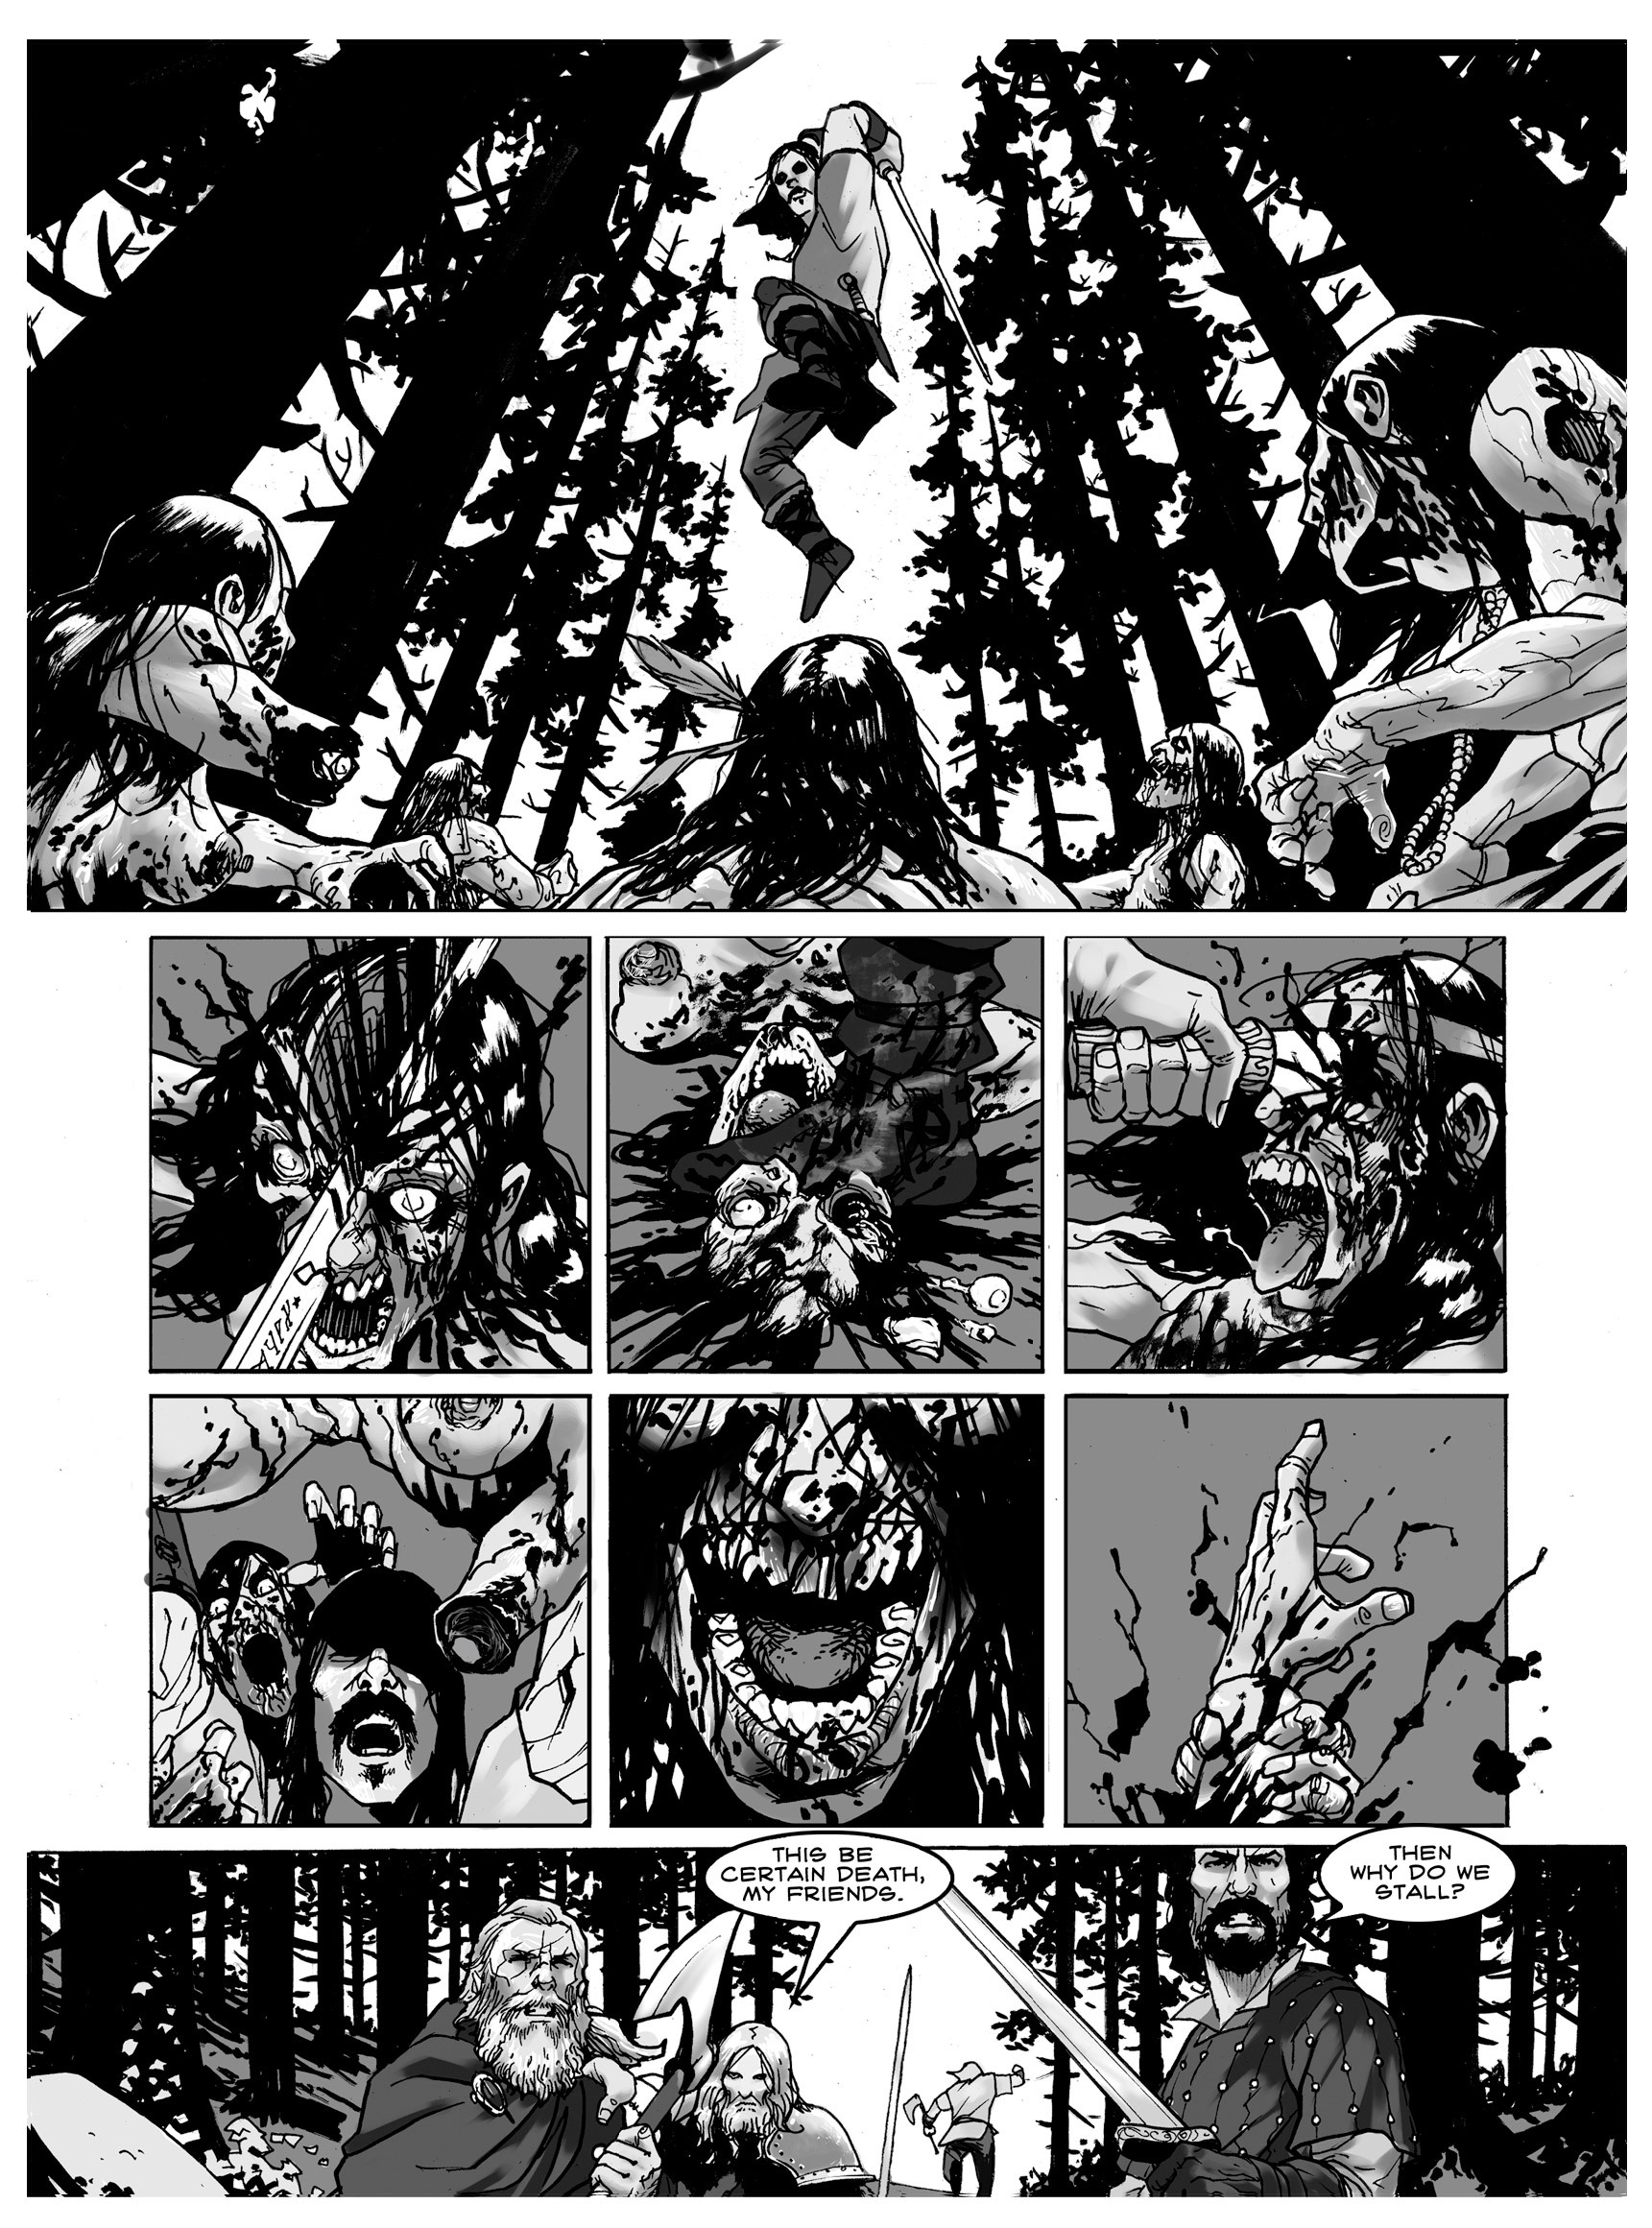 Read online FUBAR comic -  Issue #3 - 11